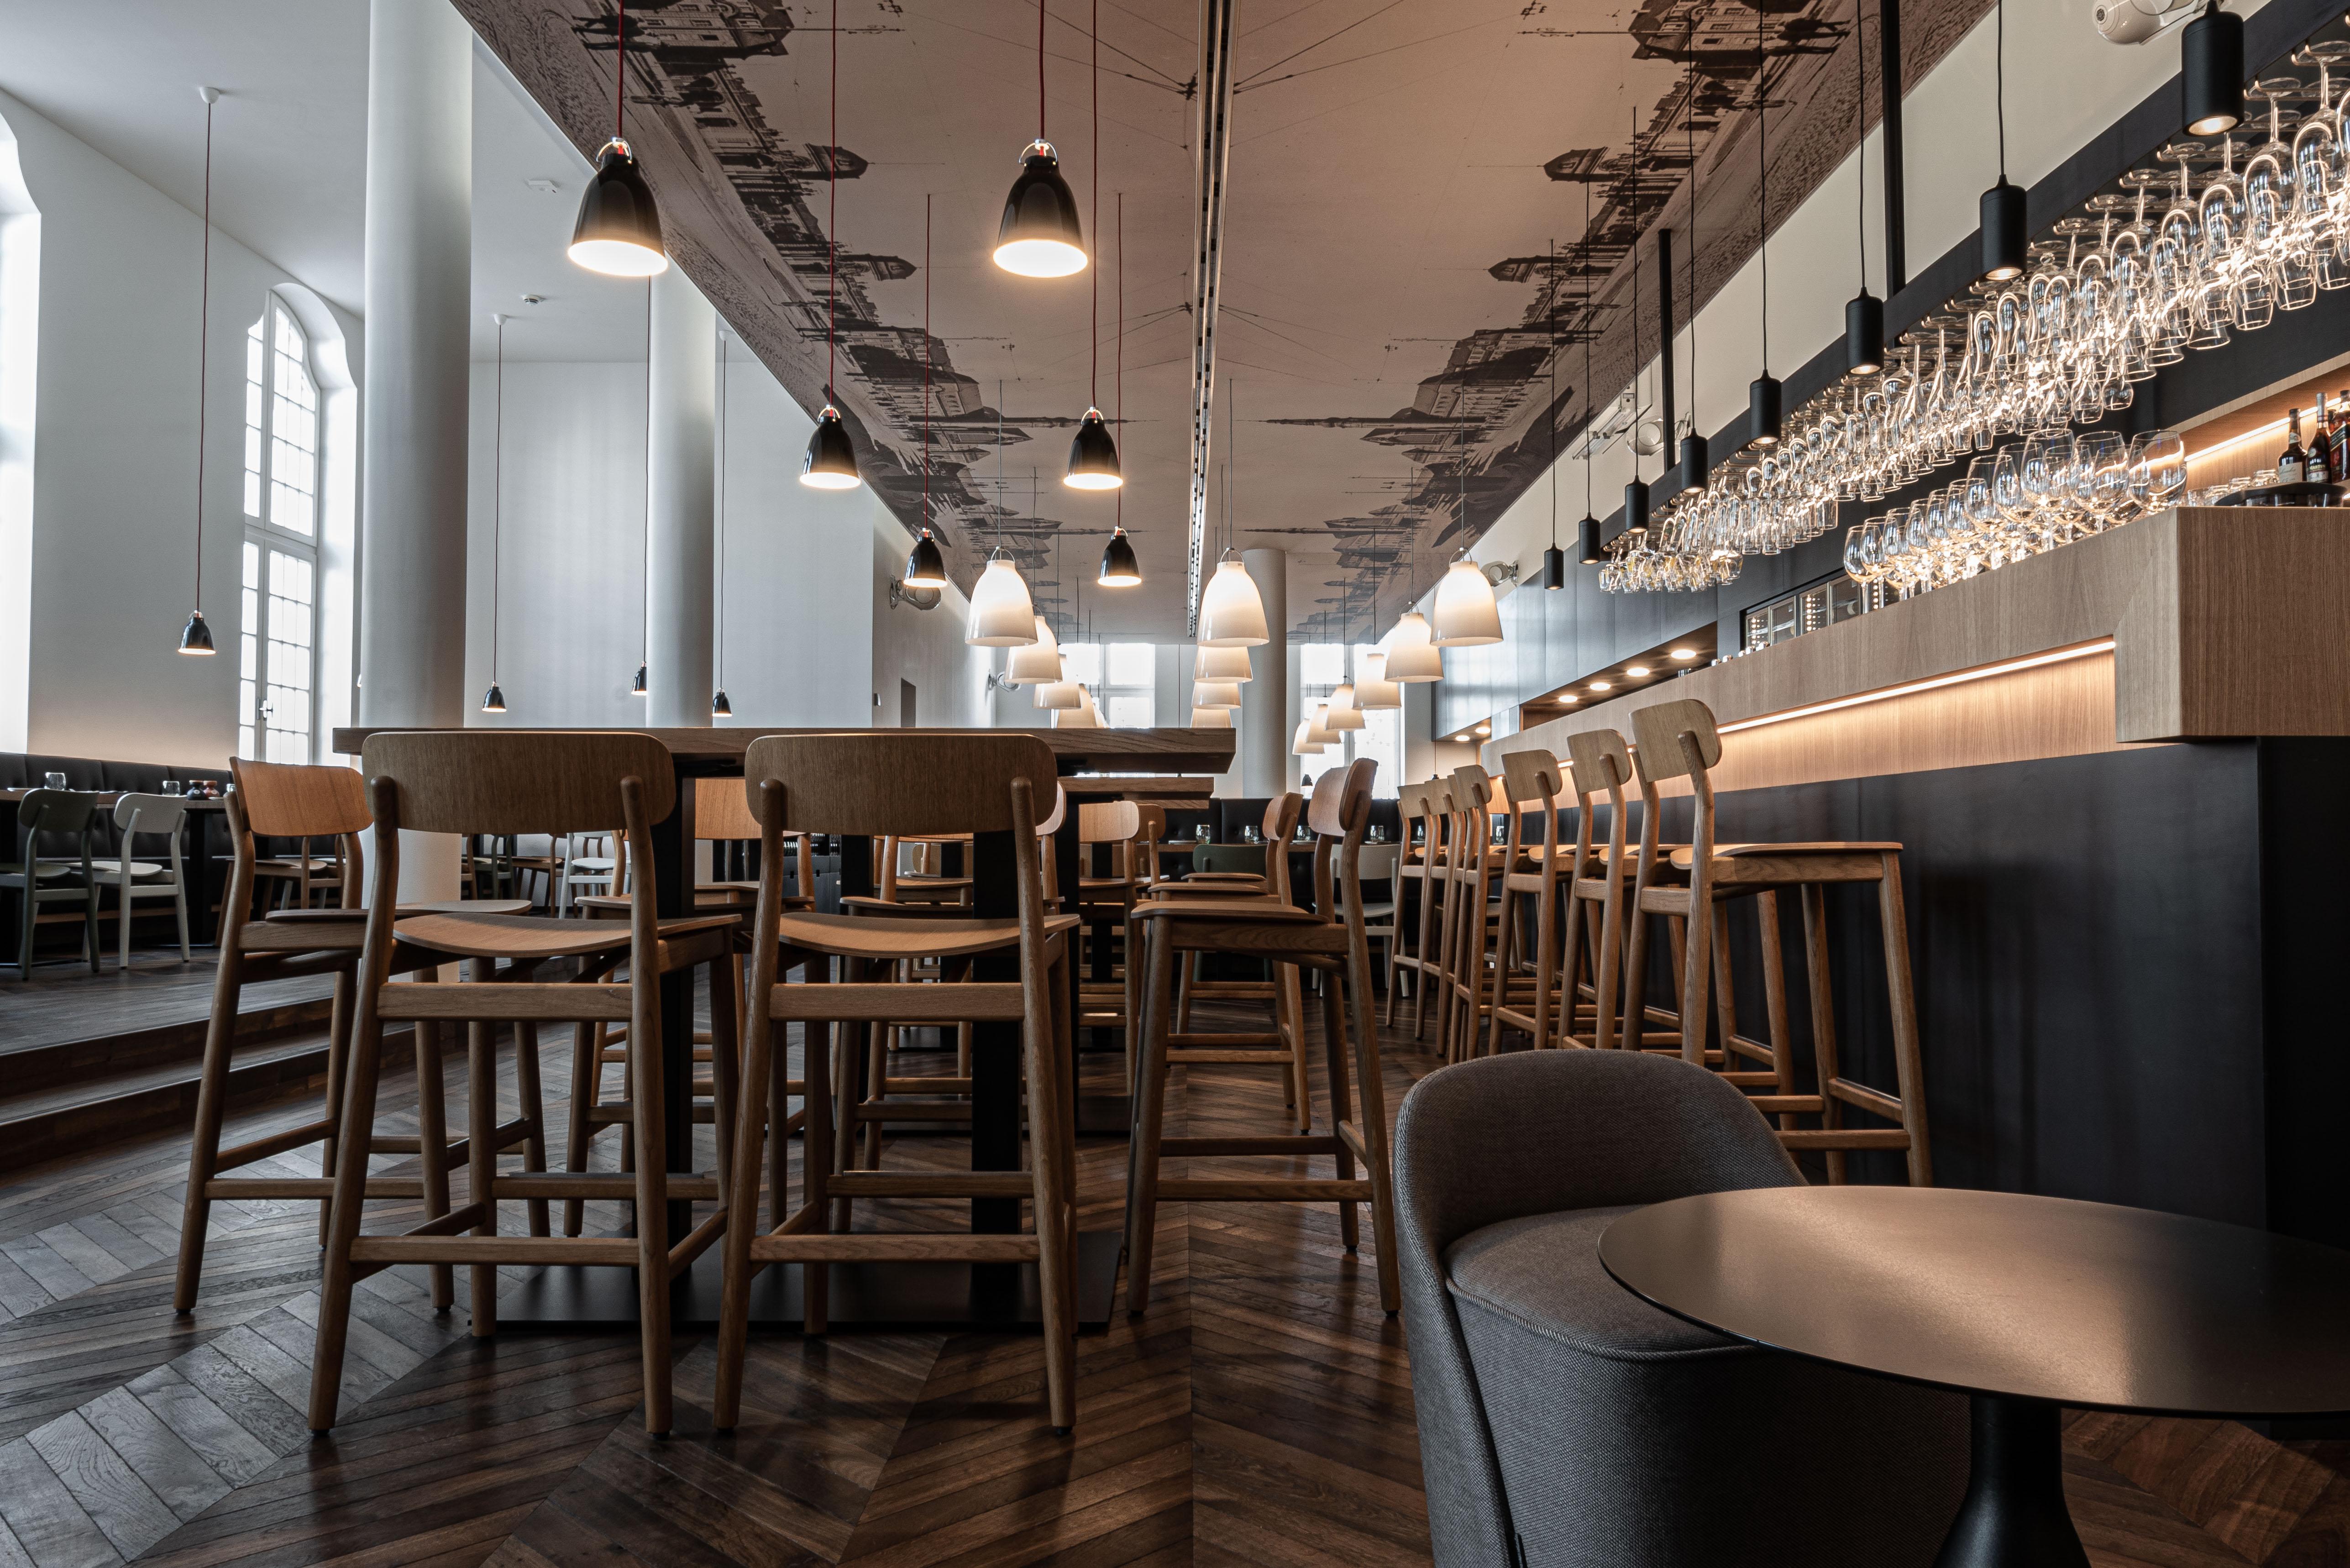 le-quai-steffen-restaurant-gare-luxembourg-take-away-cfl-resto-lunch-julie-merhi-photographe1